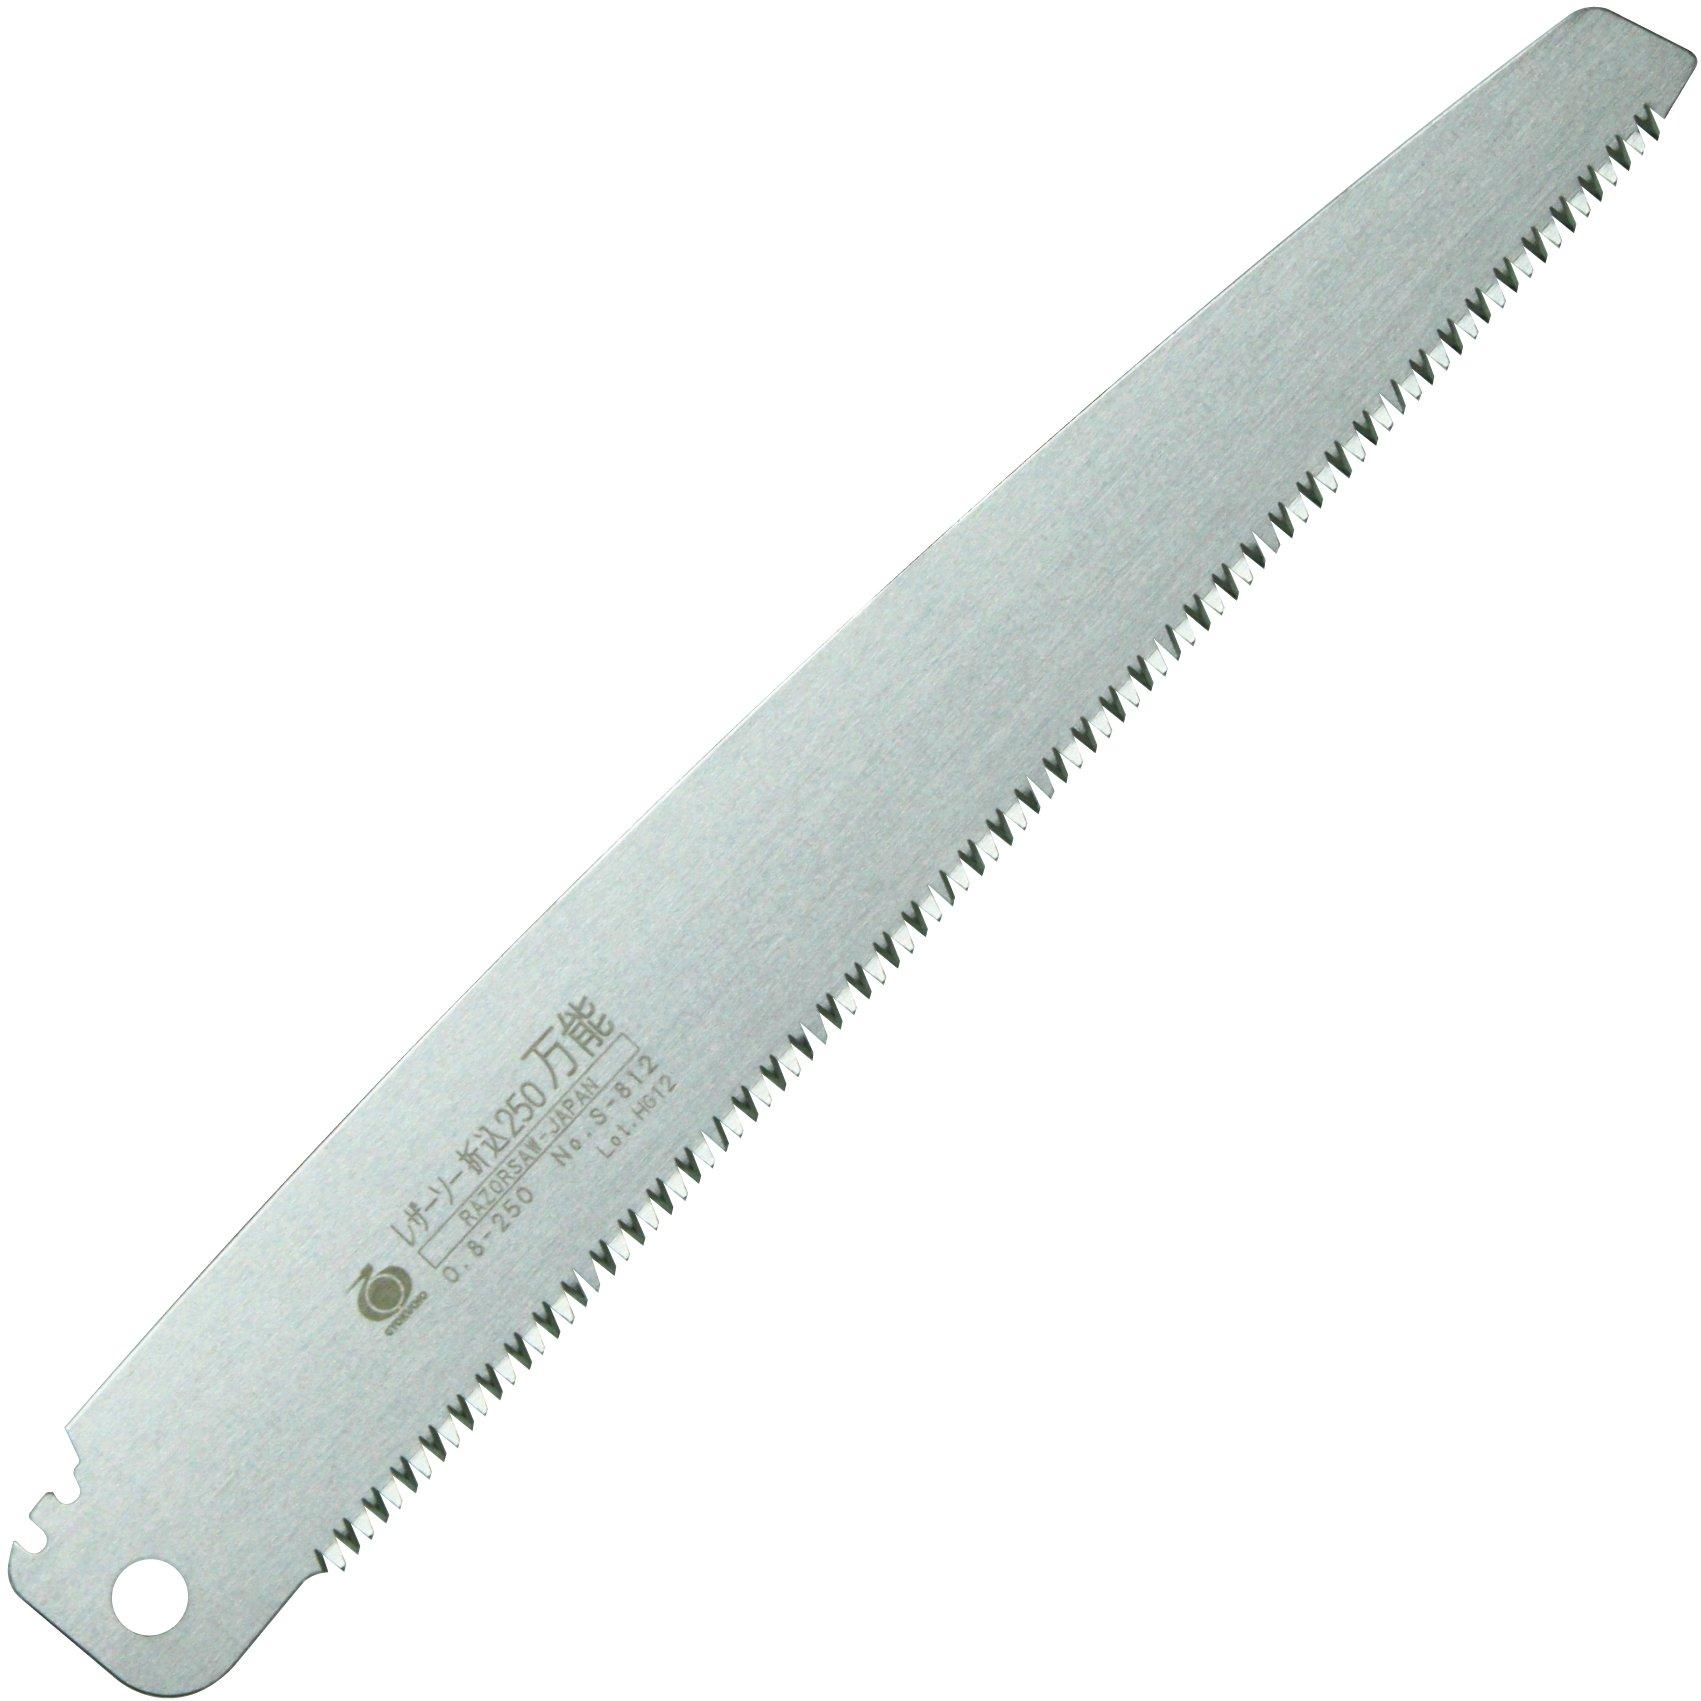 RAZOR Saw Folding 250 Multitask Extra blade S-812